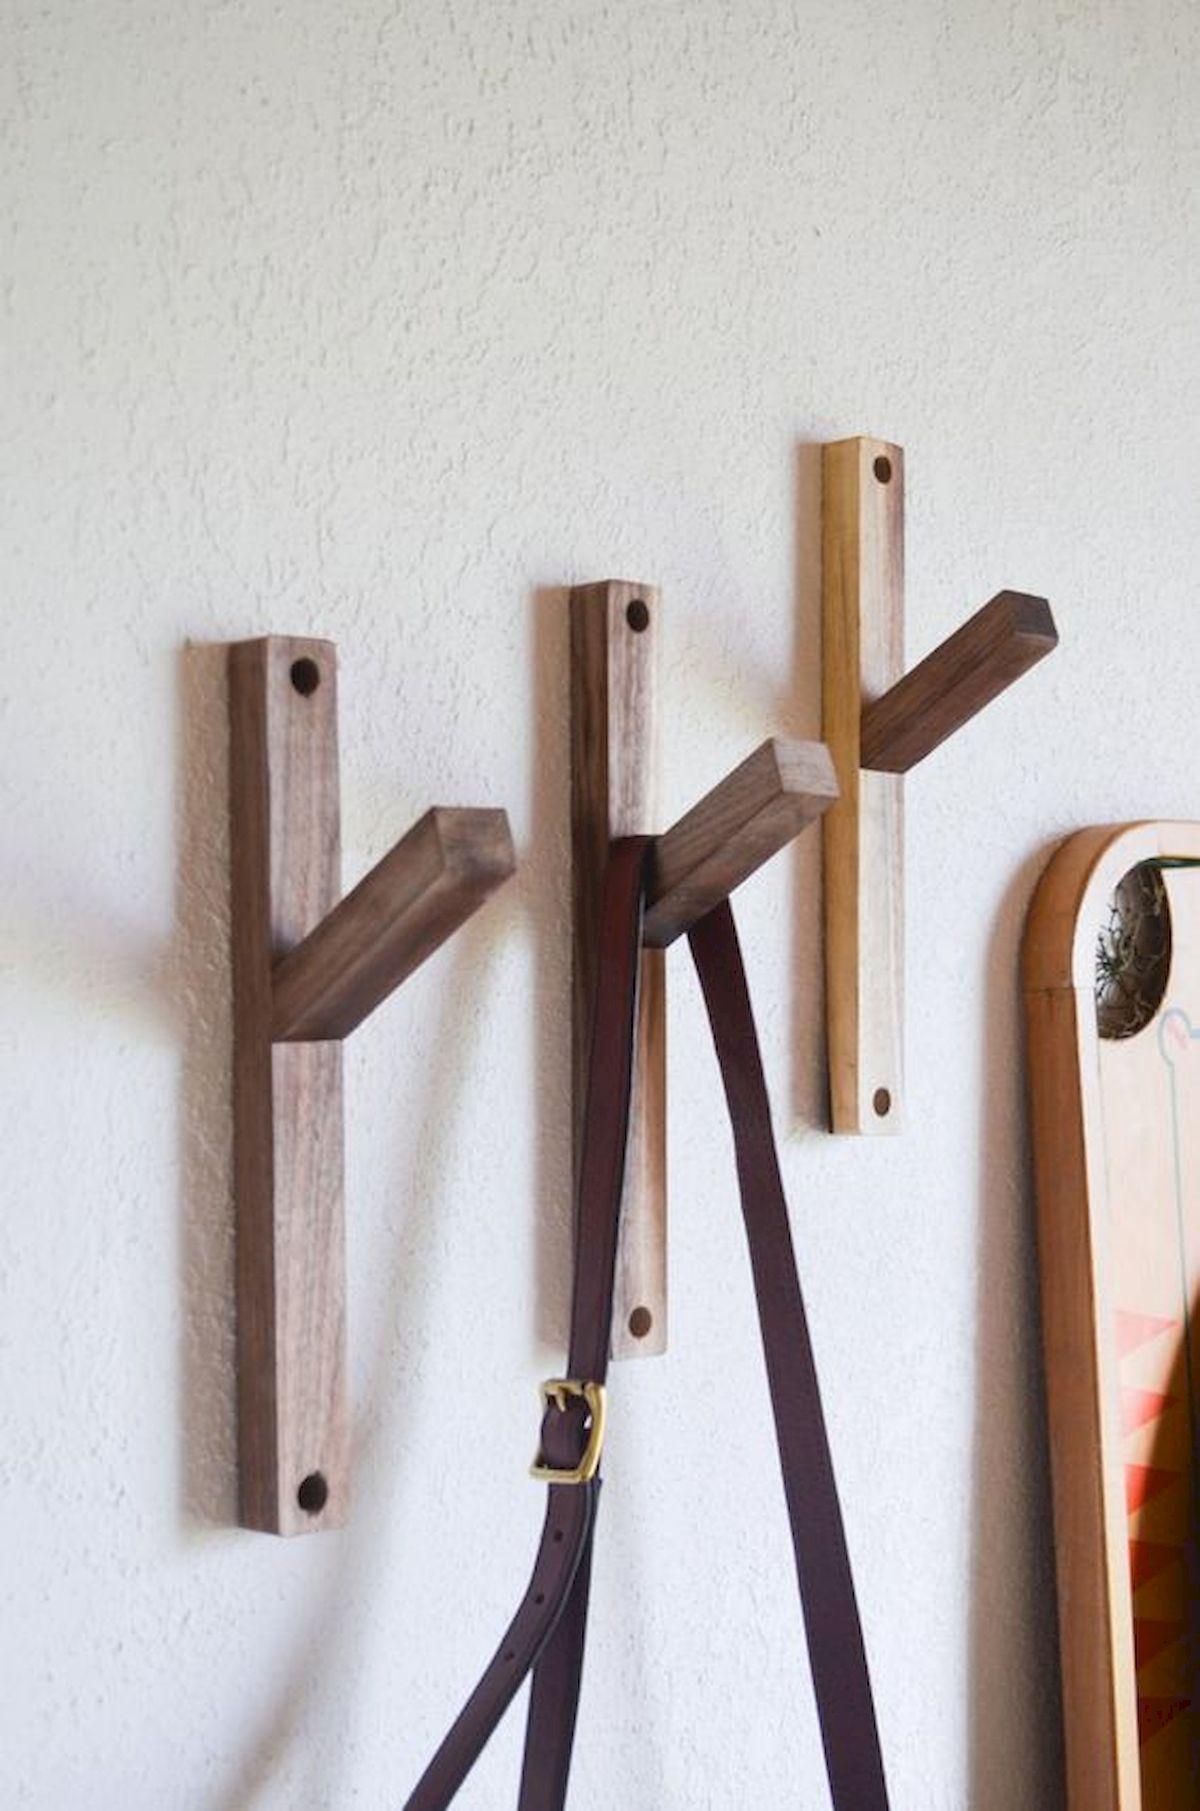 30 Fantastic DIY Hanger Ideas From Wooden Pallets (3)